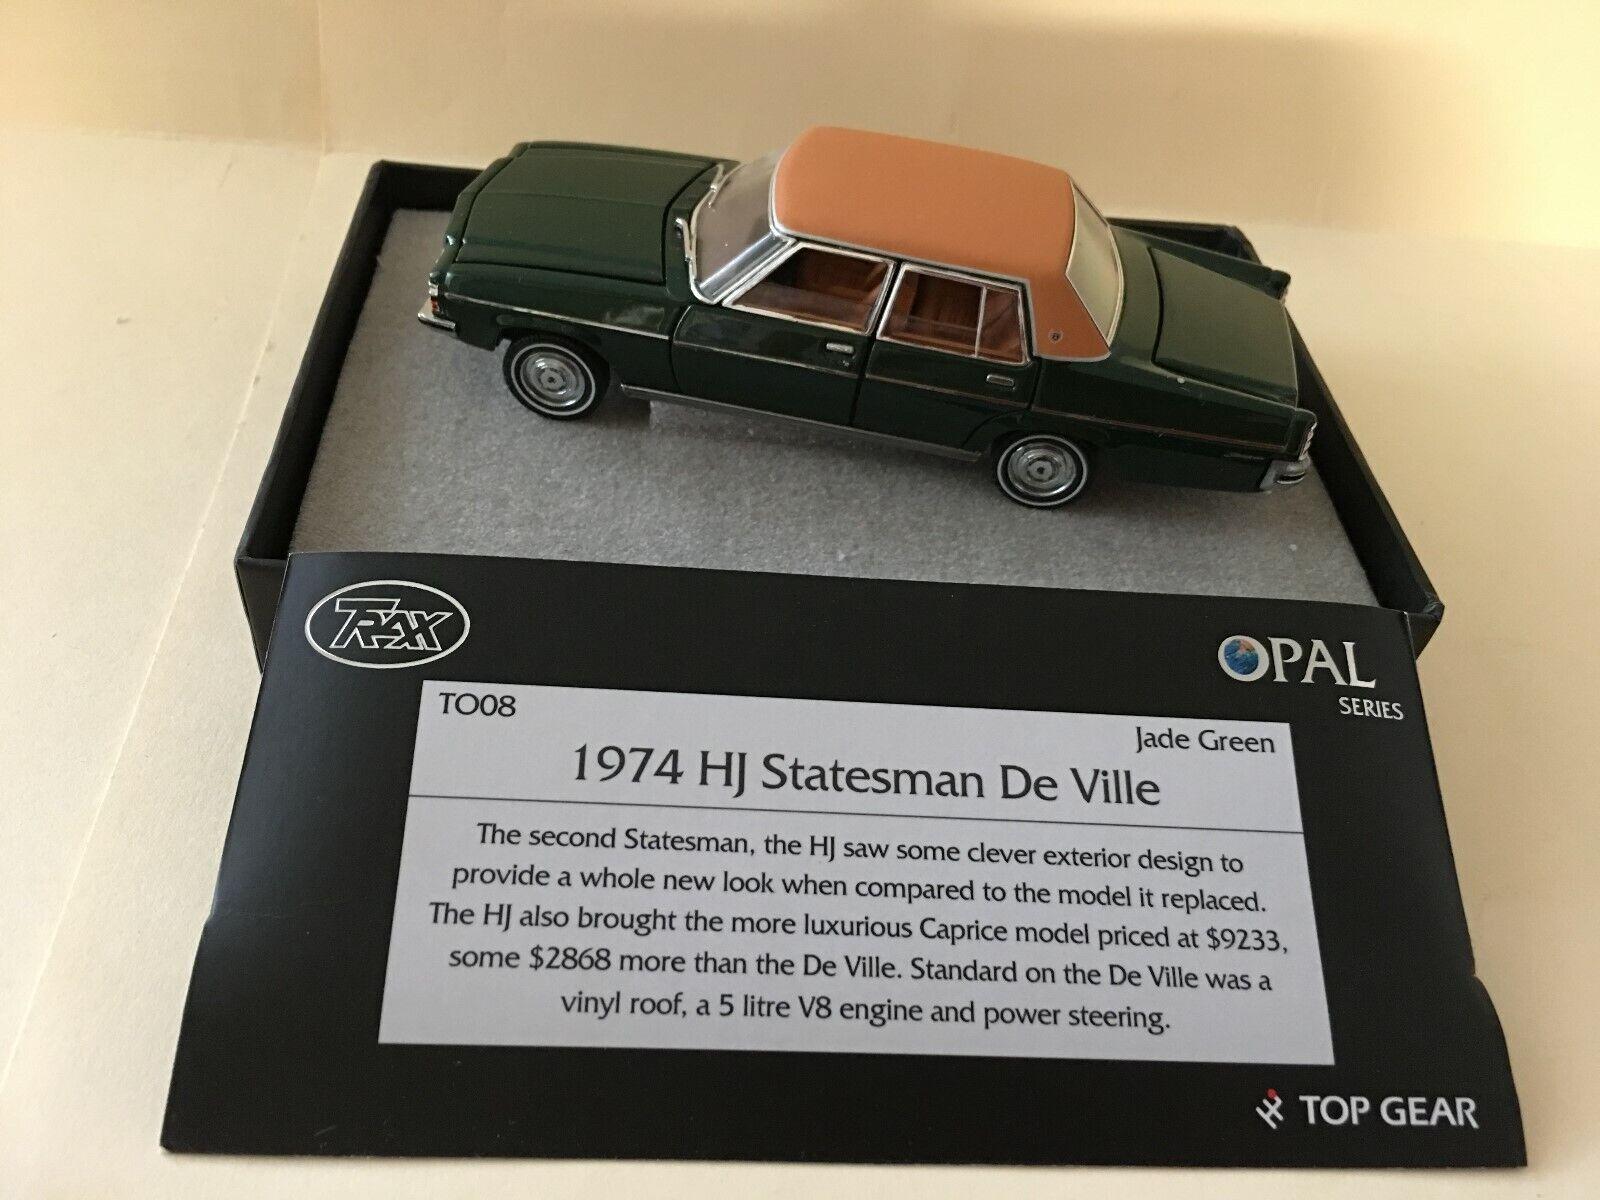 1 43  TRAX T008 1974 HJ Statesman De Ville